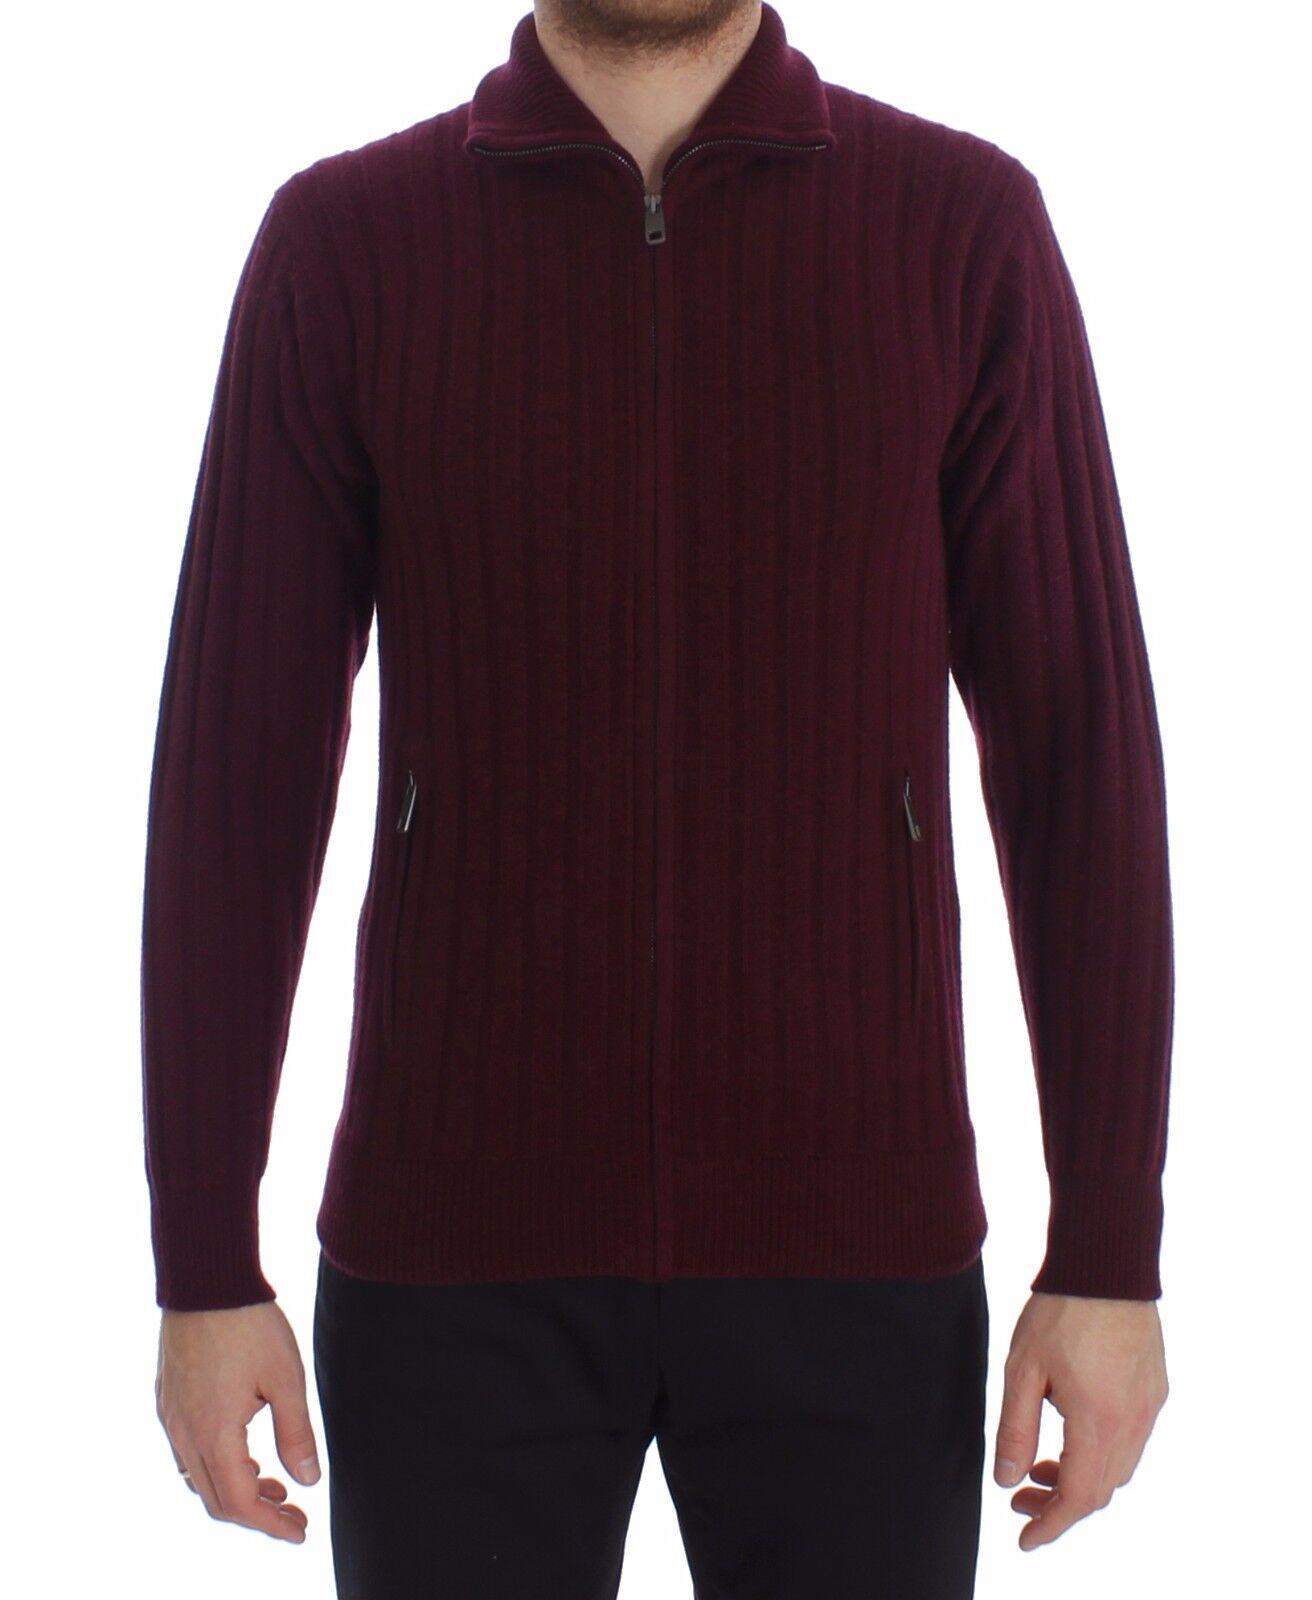 NEW DOLCE & GABBANA Sweater Cashmere Knitted Bordeaux Zipper s. IT44 / XS